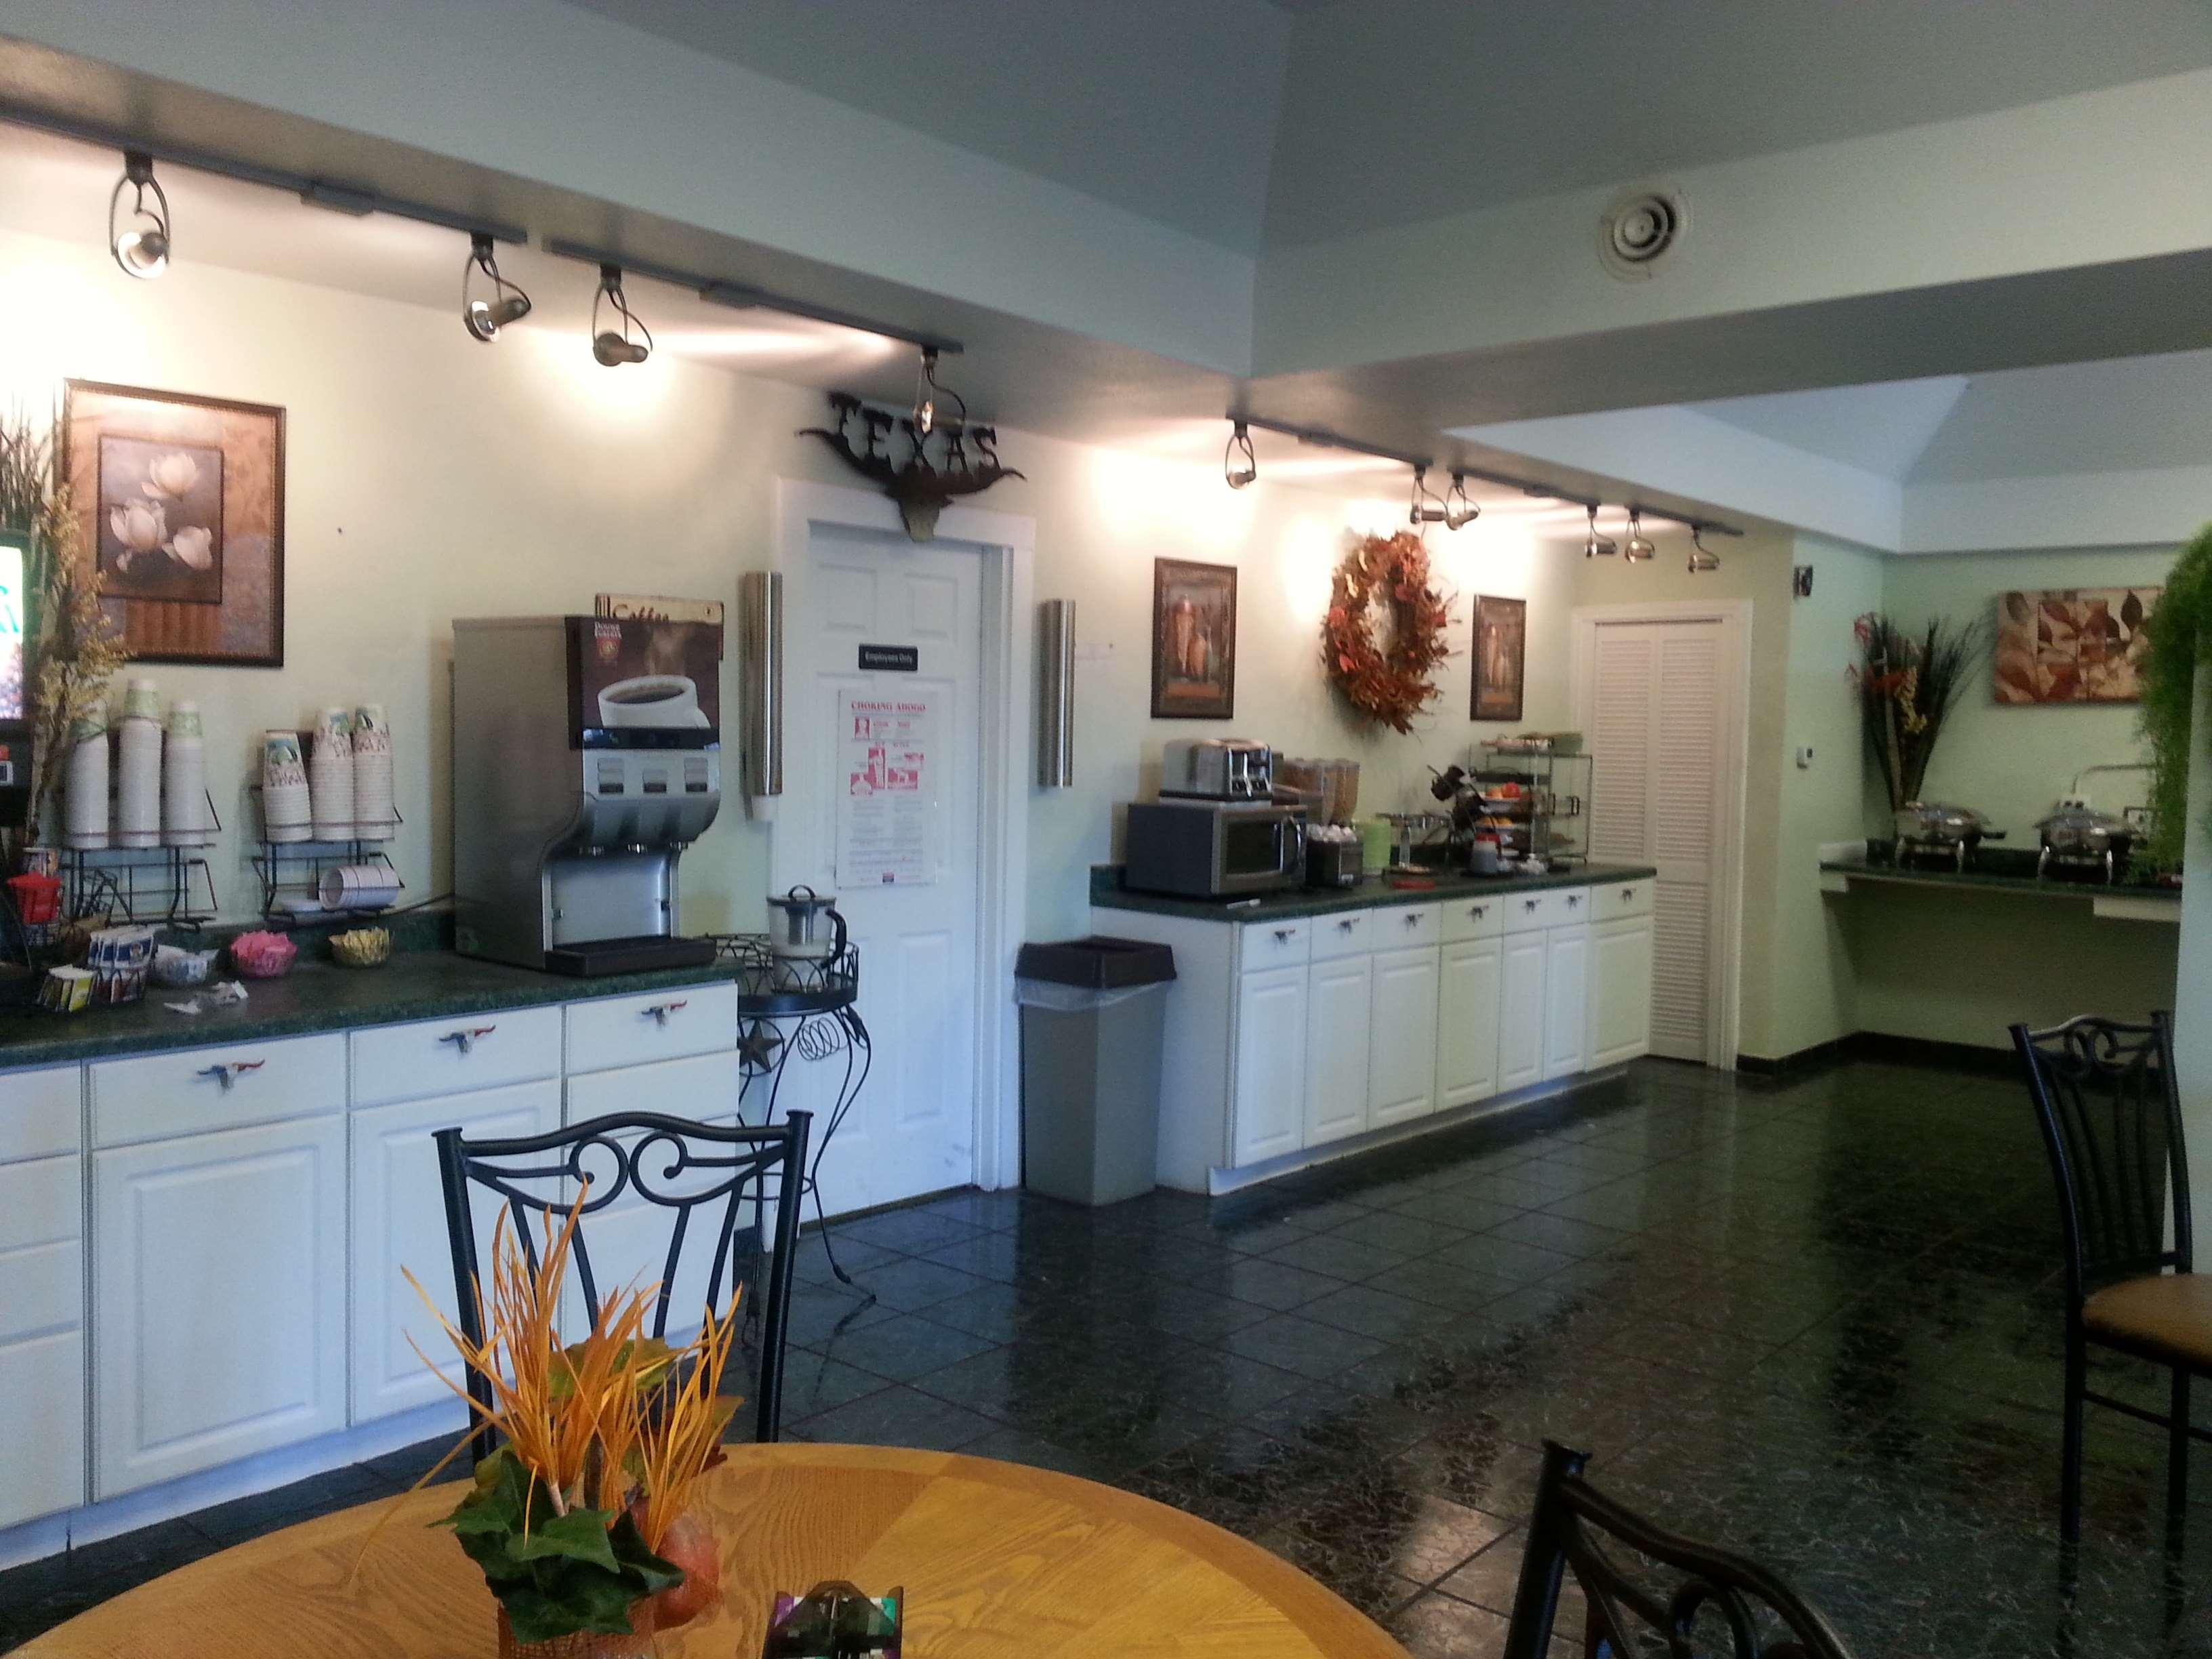 Best Western Johnson City Inn image 19